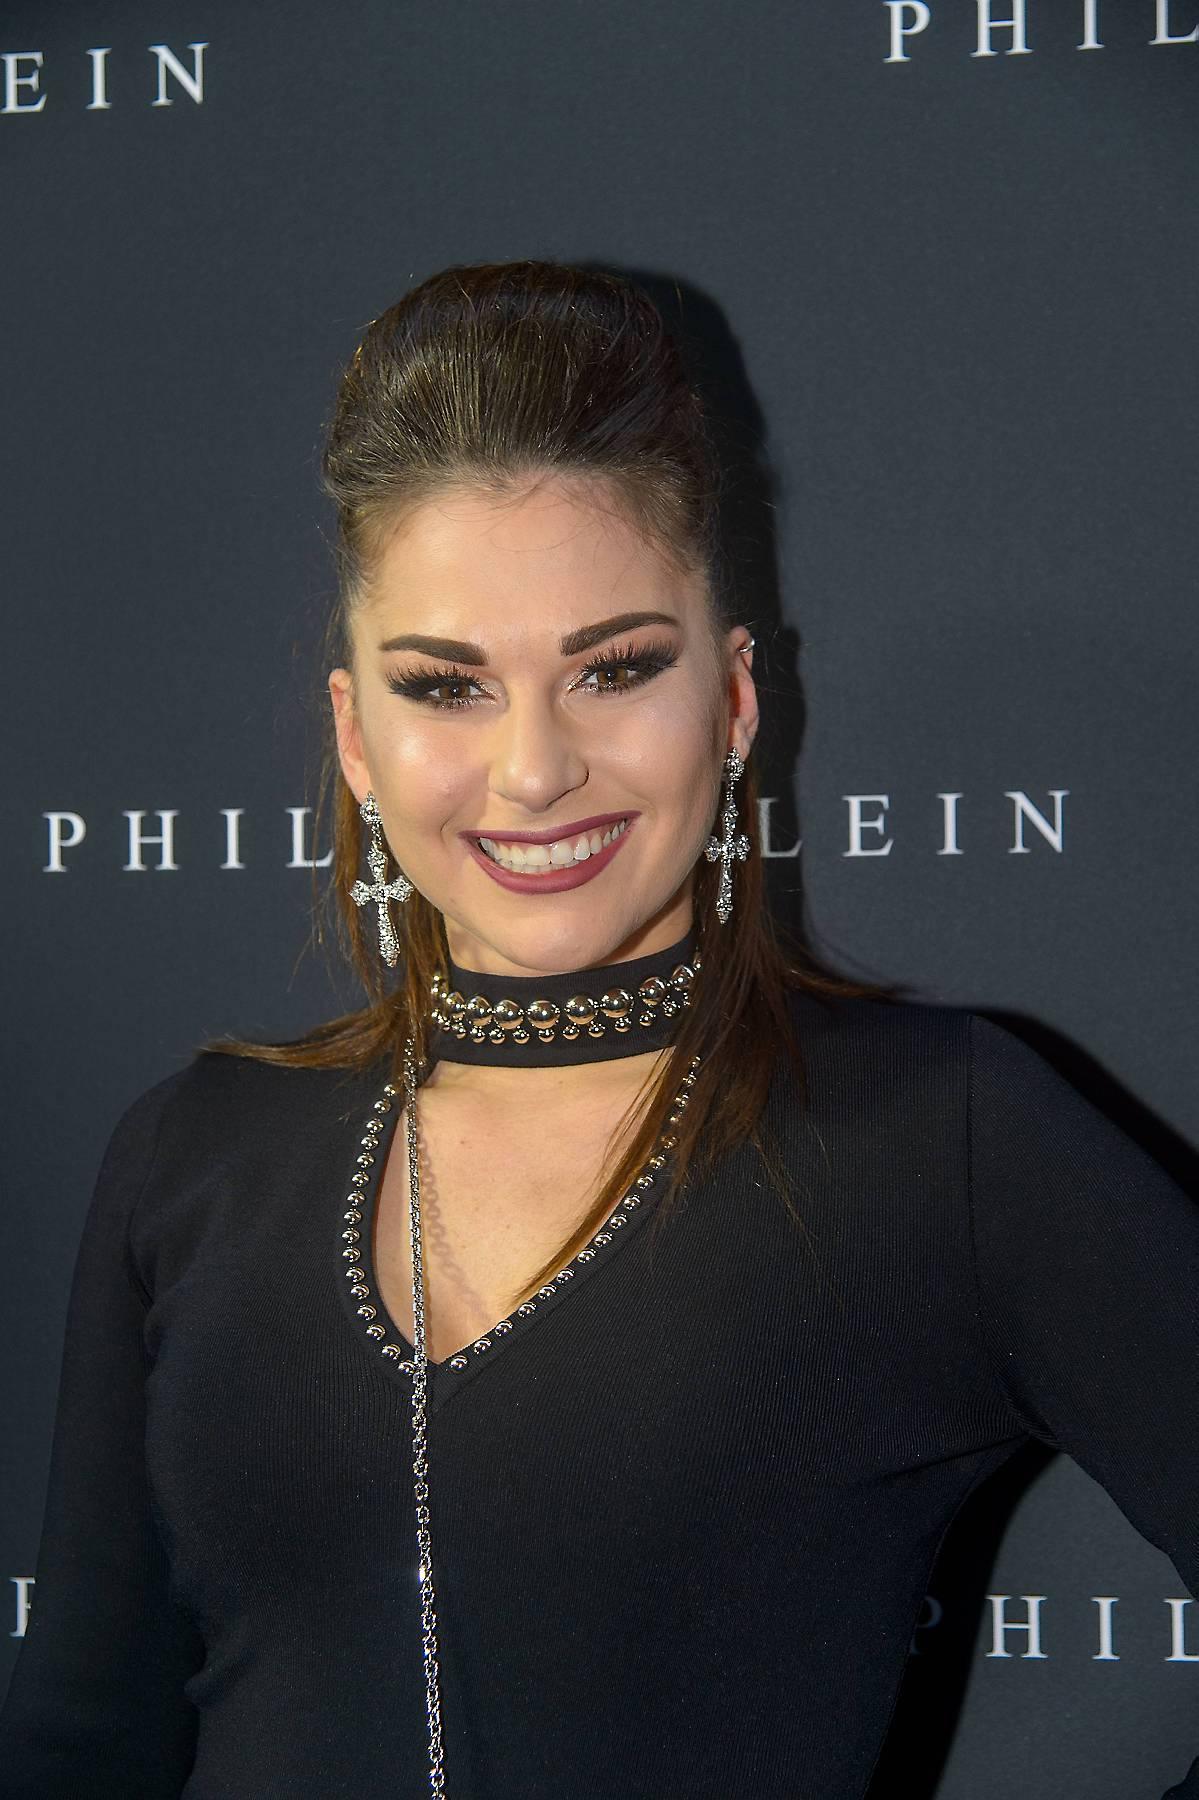 Vivian Paul